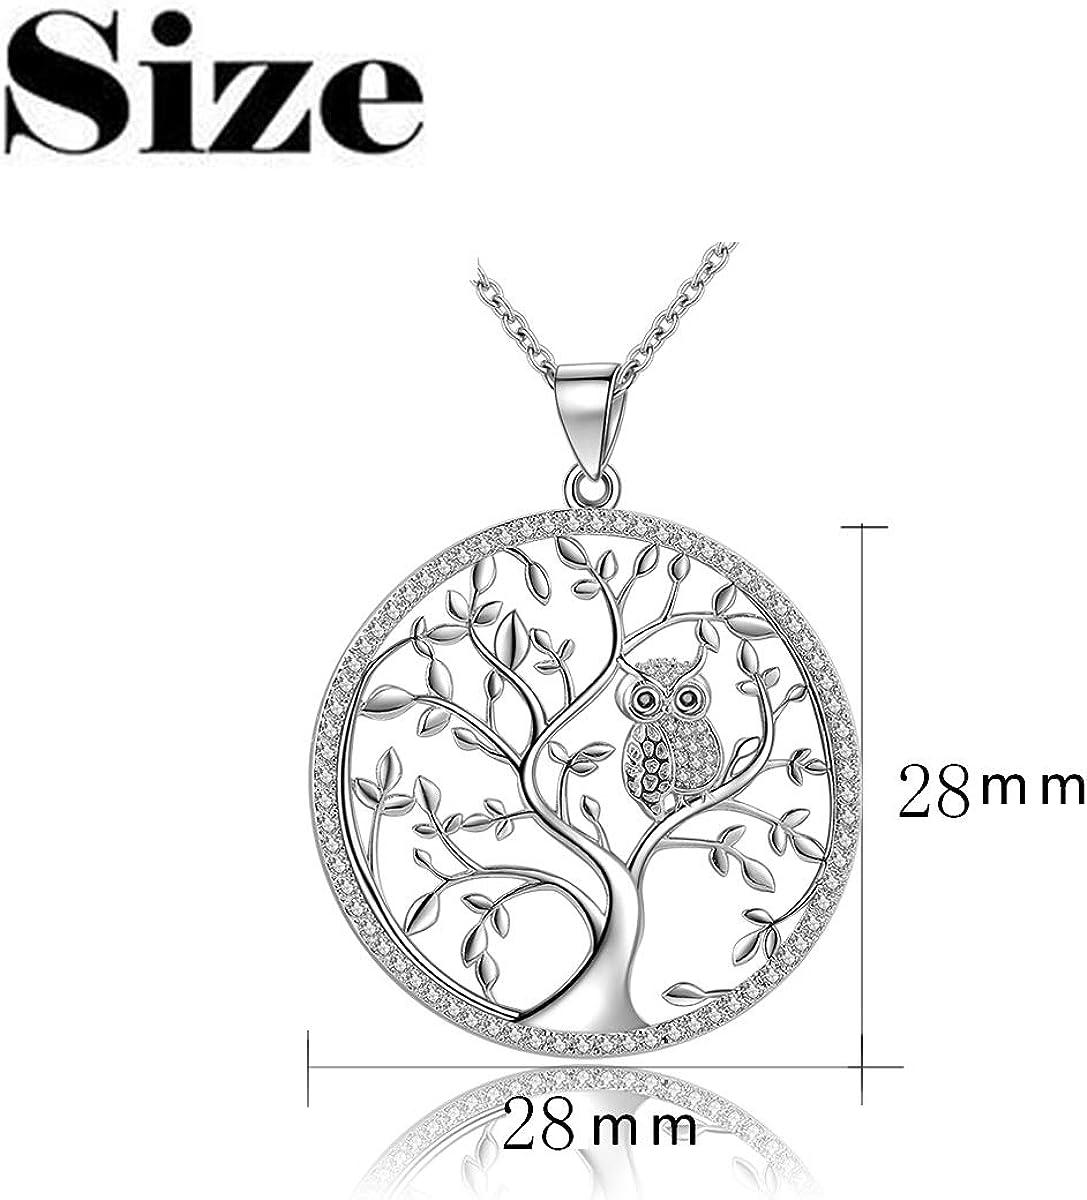 Art Deco Tree and Bird Nature Glass Pendant Silver Handmade Art Necklace Gift Present